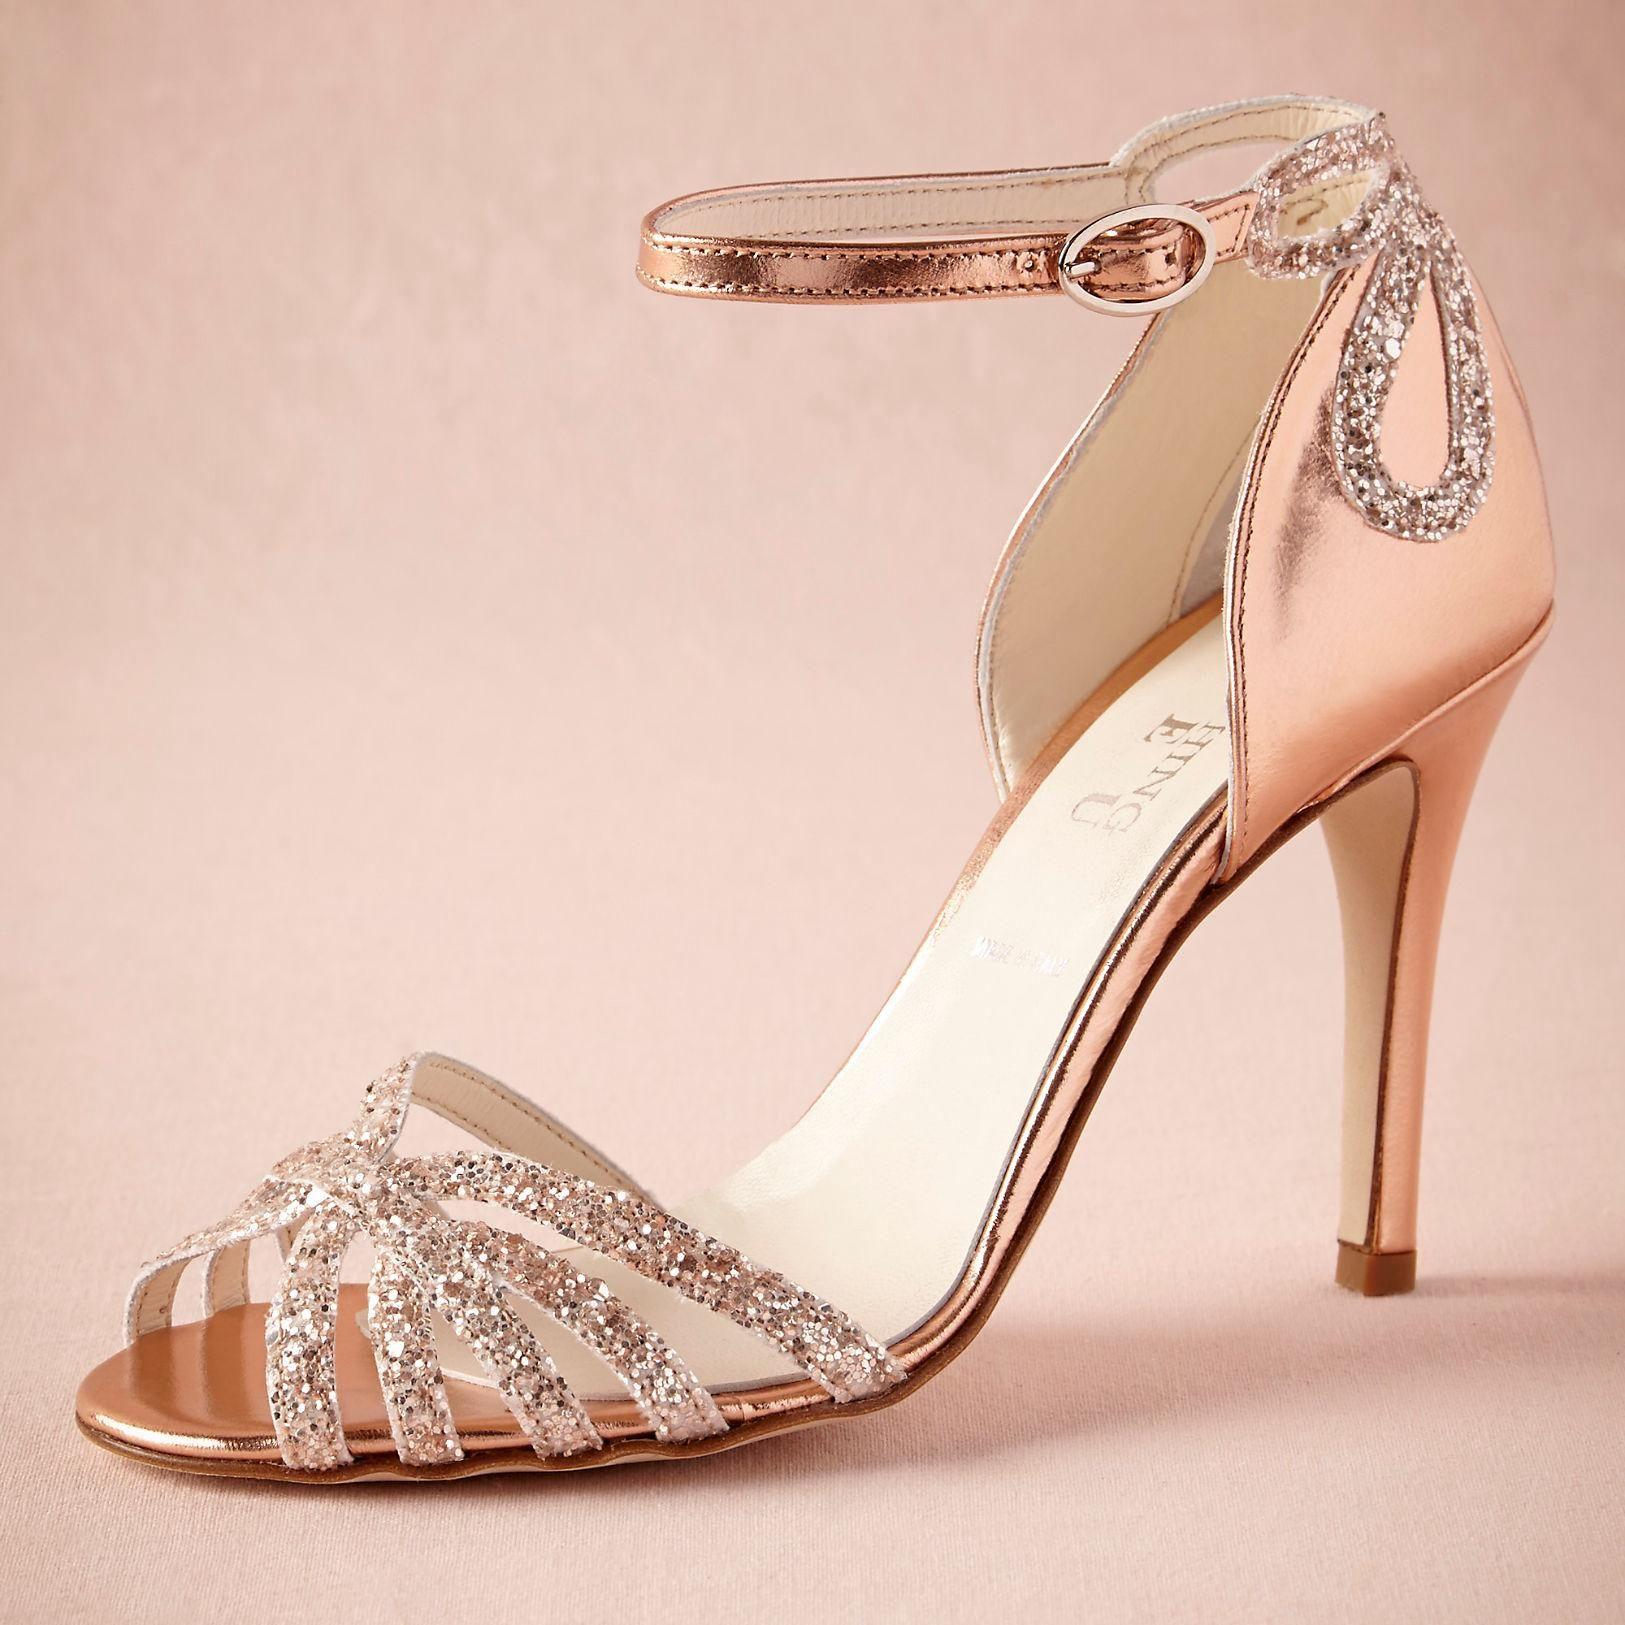 Bridal Shoes Ivory Satin Pearl Beaded Diamante Perfect Vintage Bridal 3.5/'/' Heel